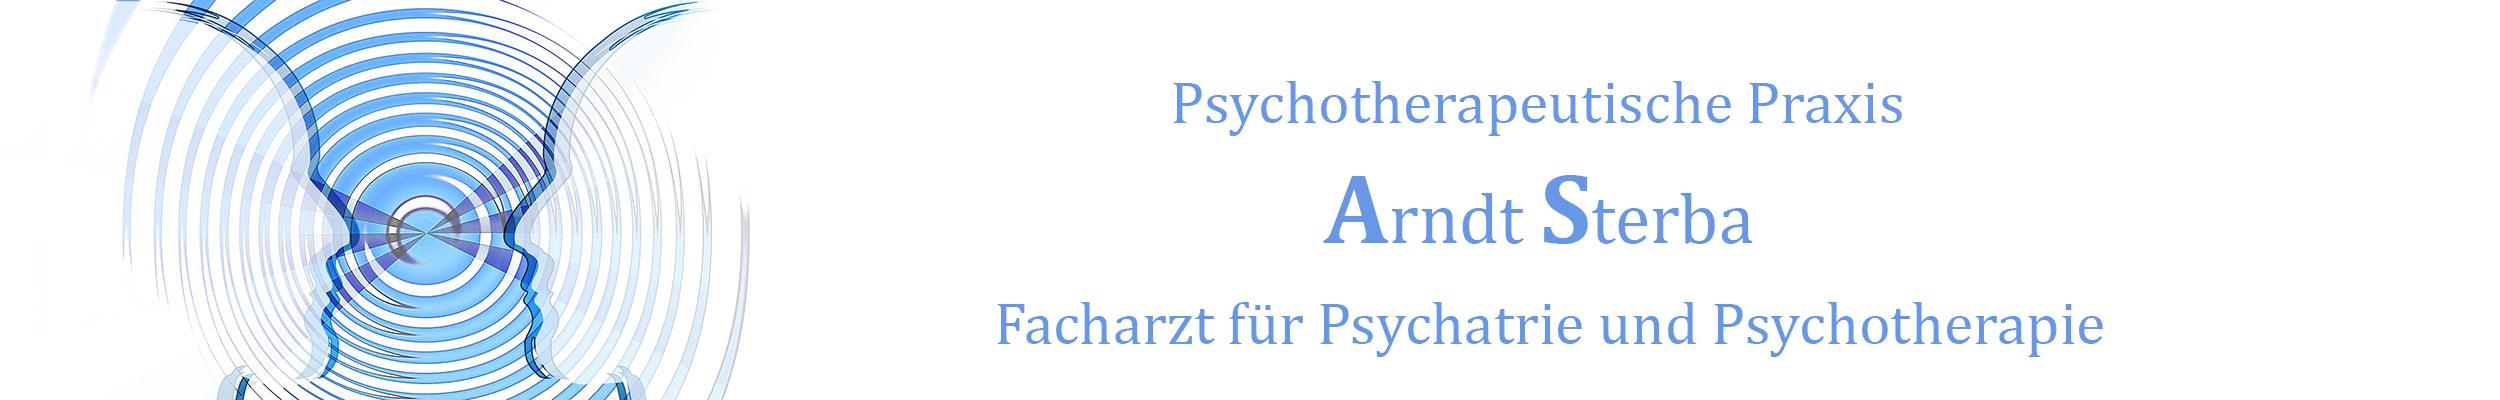 Psychotherapeutische Praxis Arndt Sterba